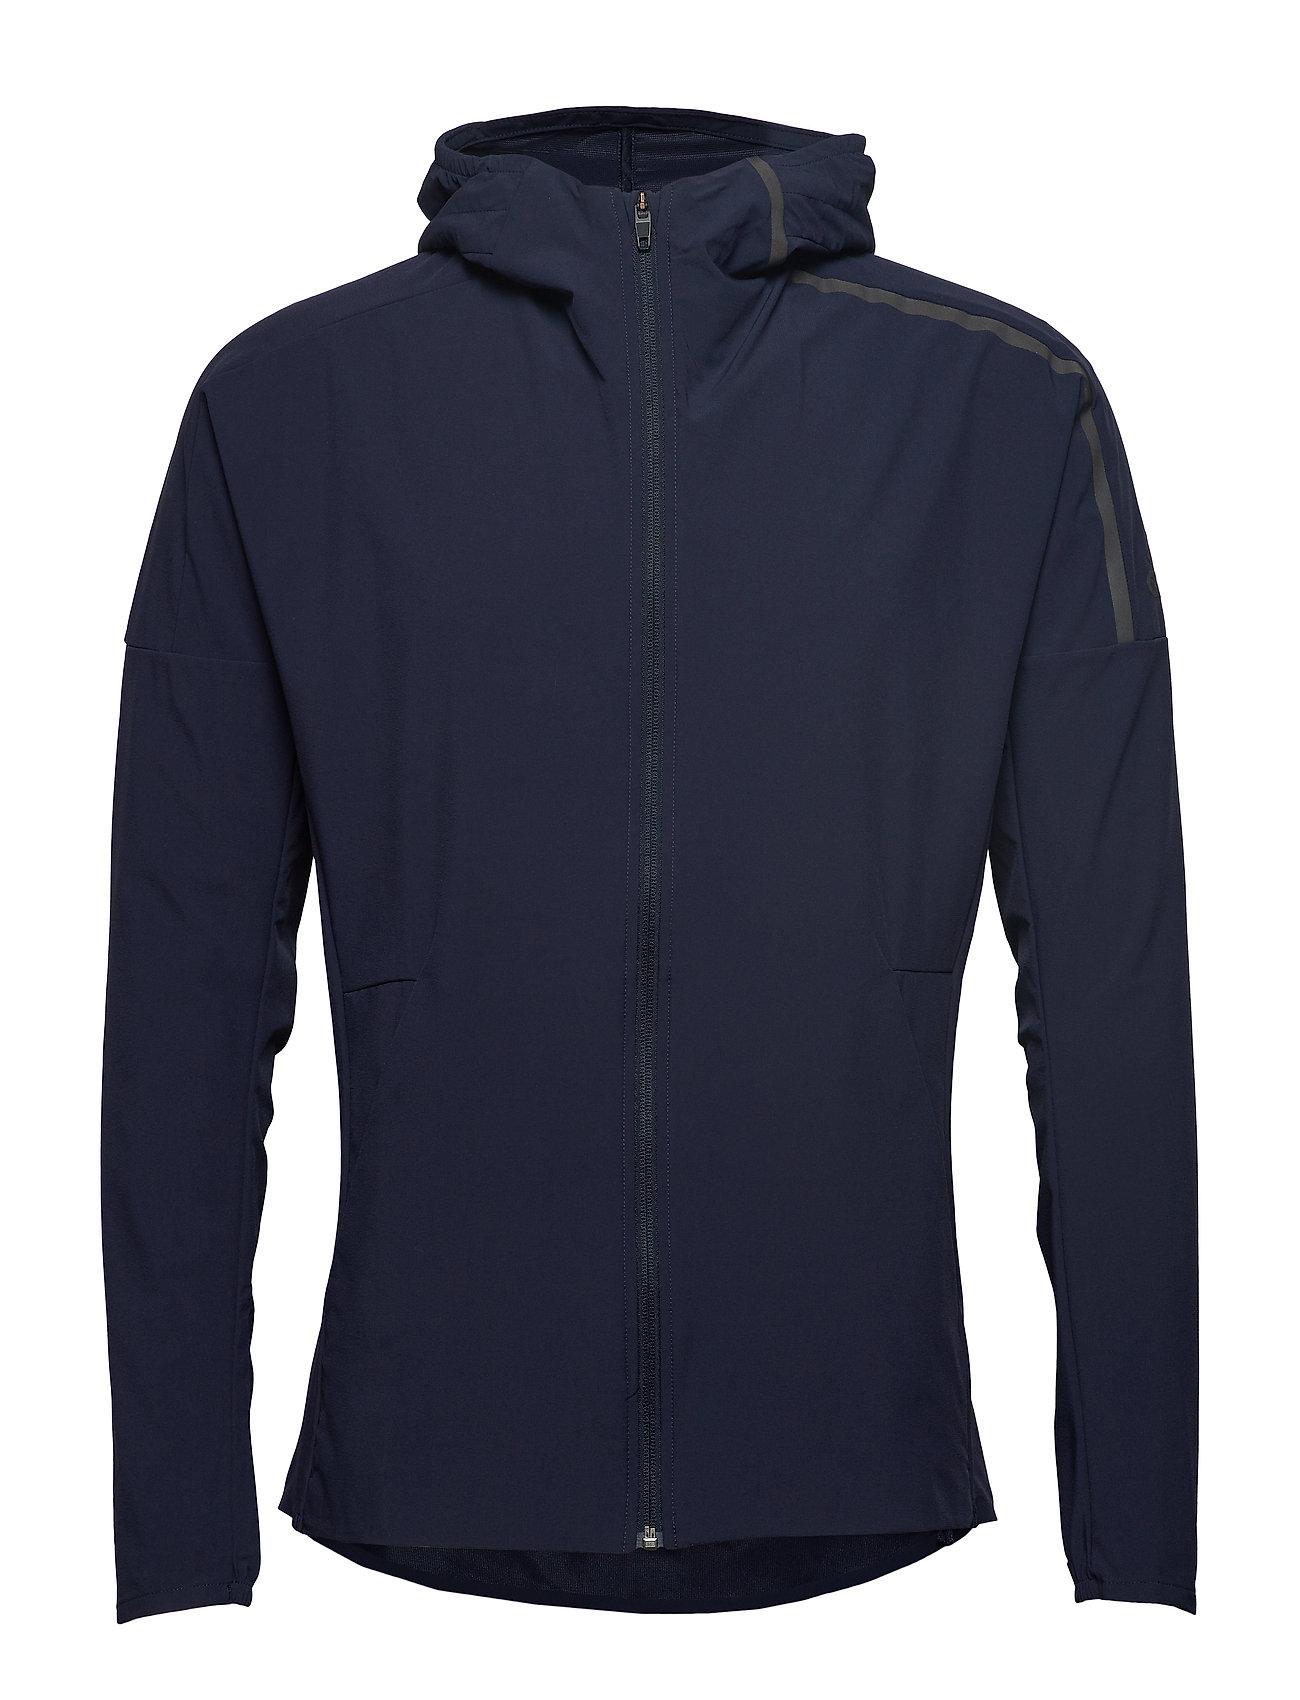 40% Sale Z.N.E. Jacket M Dünne Jacke Blau ADIDAS |